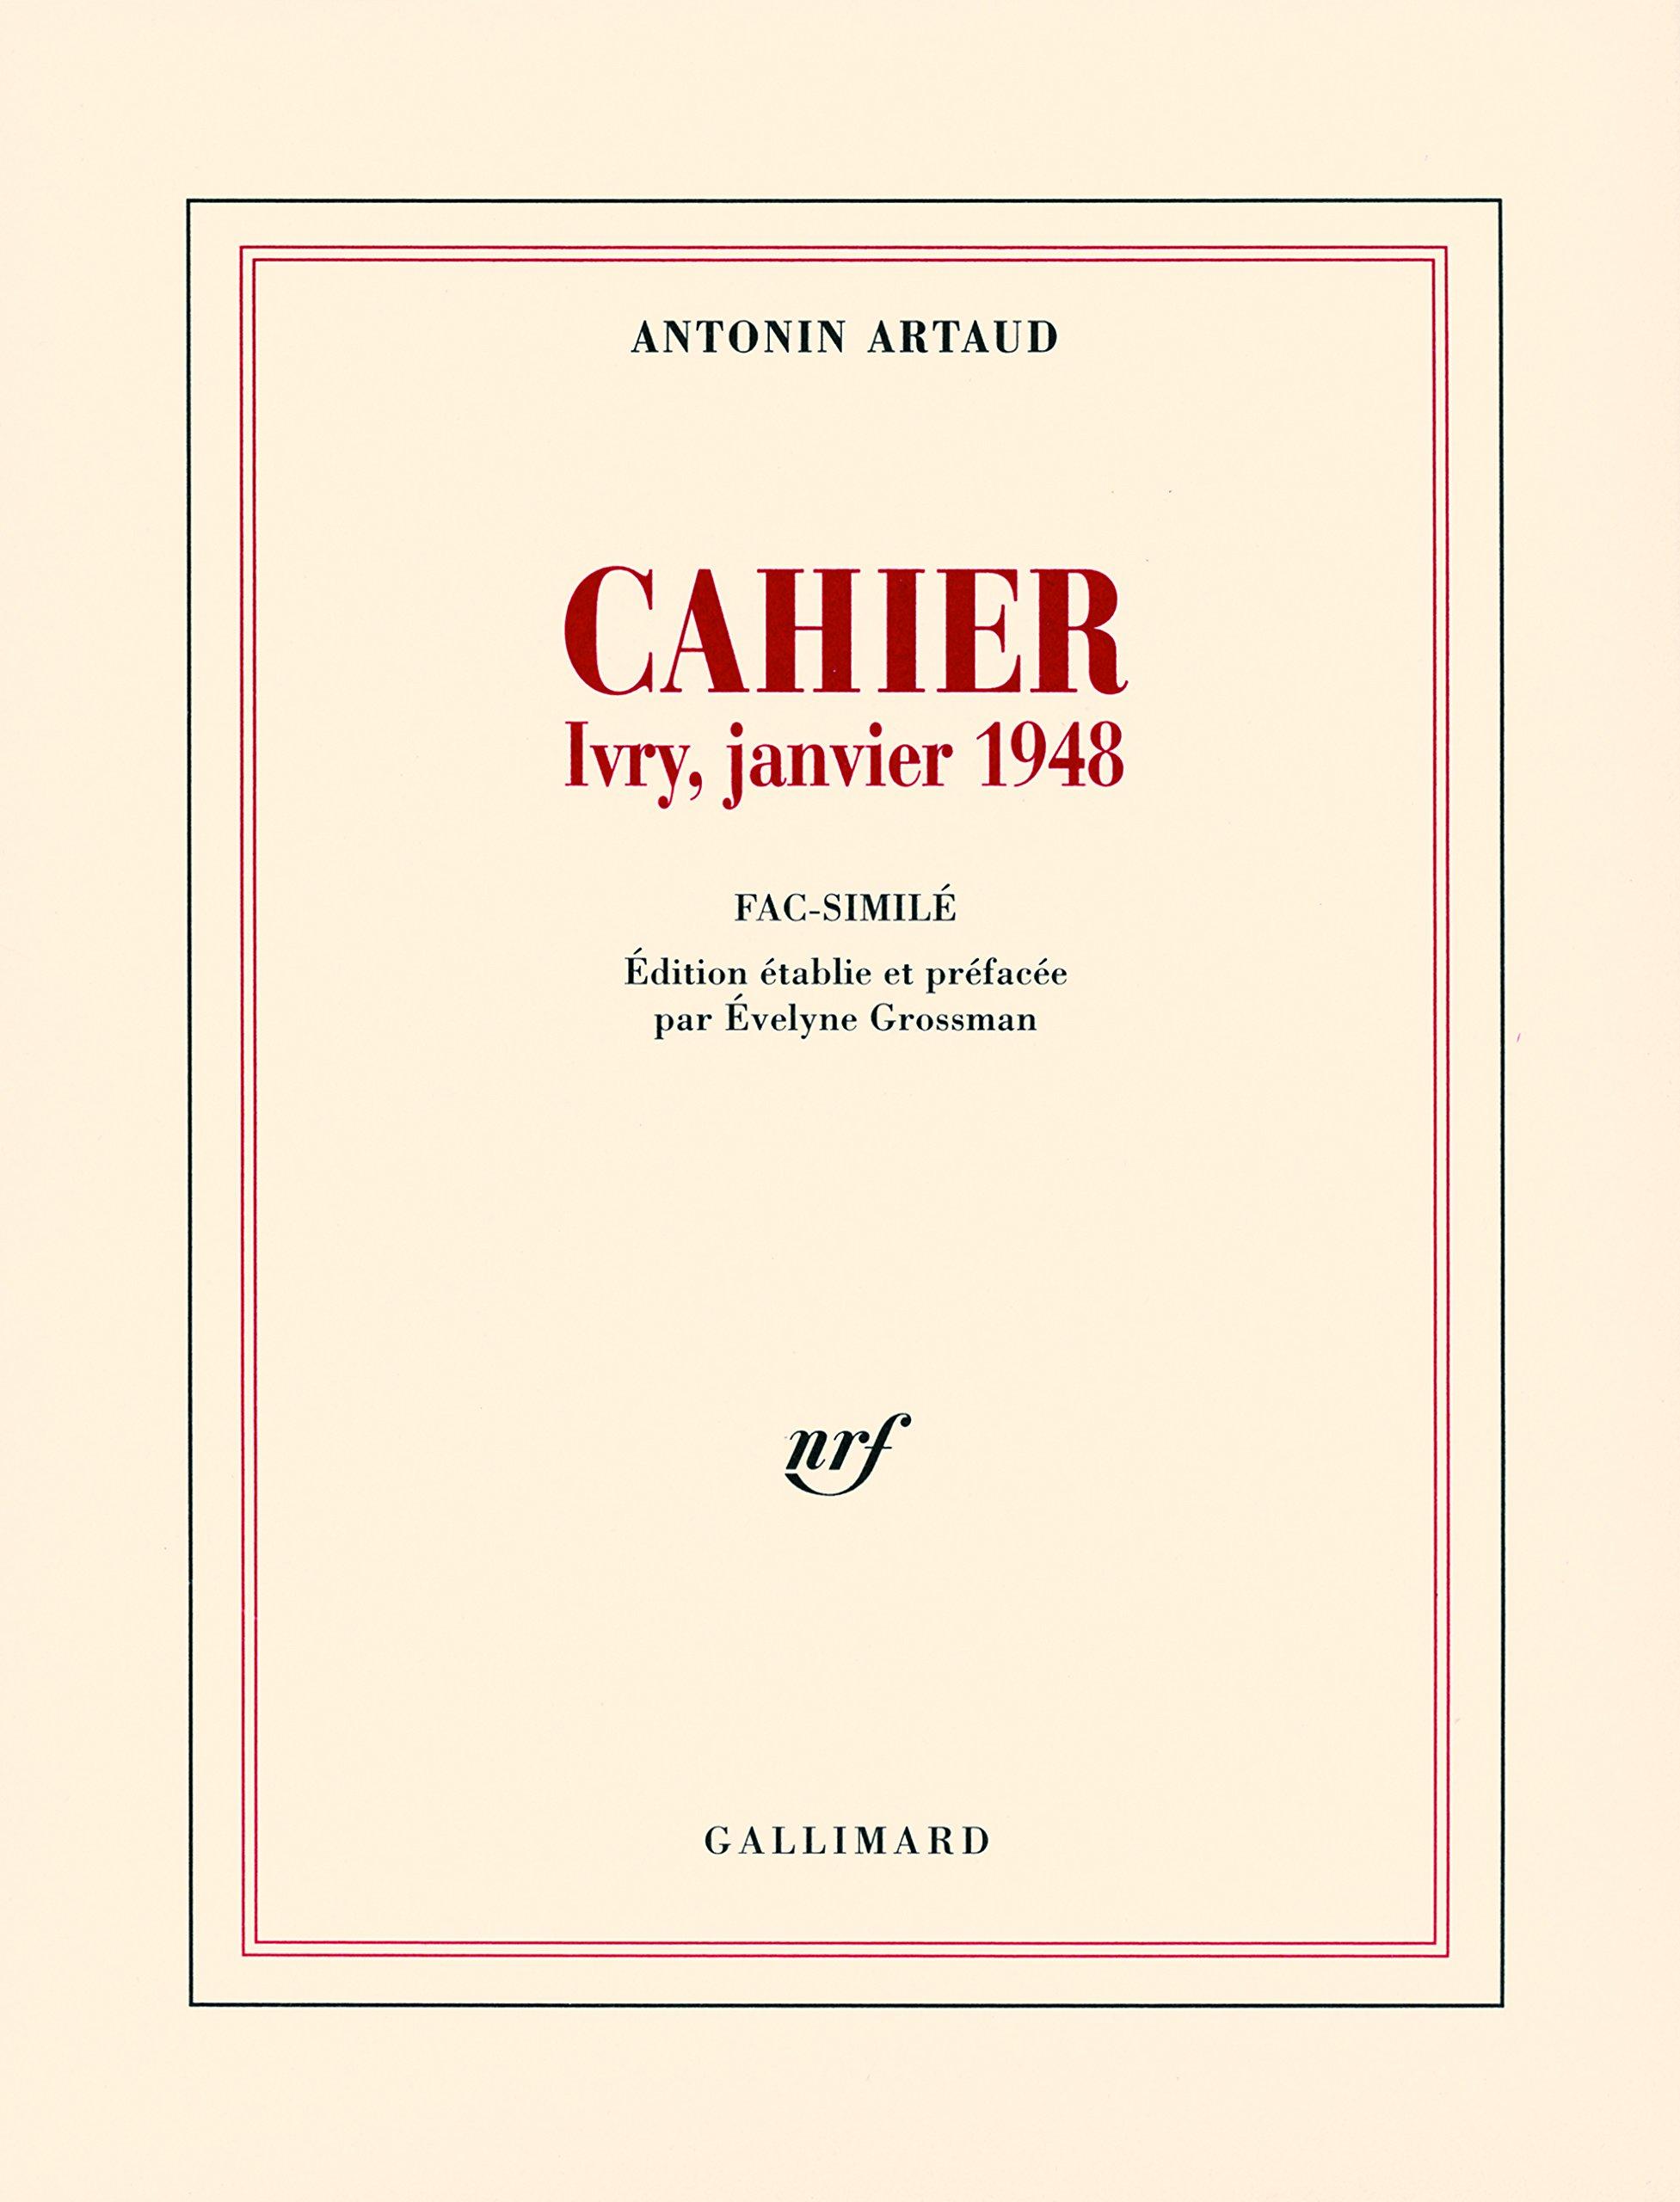 Cahier: Ivry, janvier 1948 por Antonin Artaud